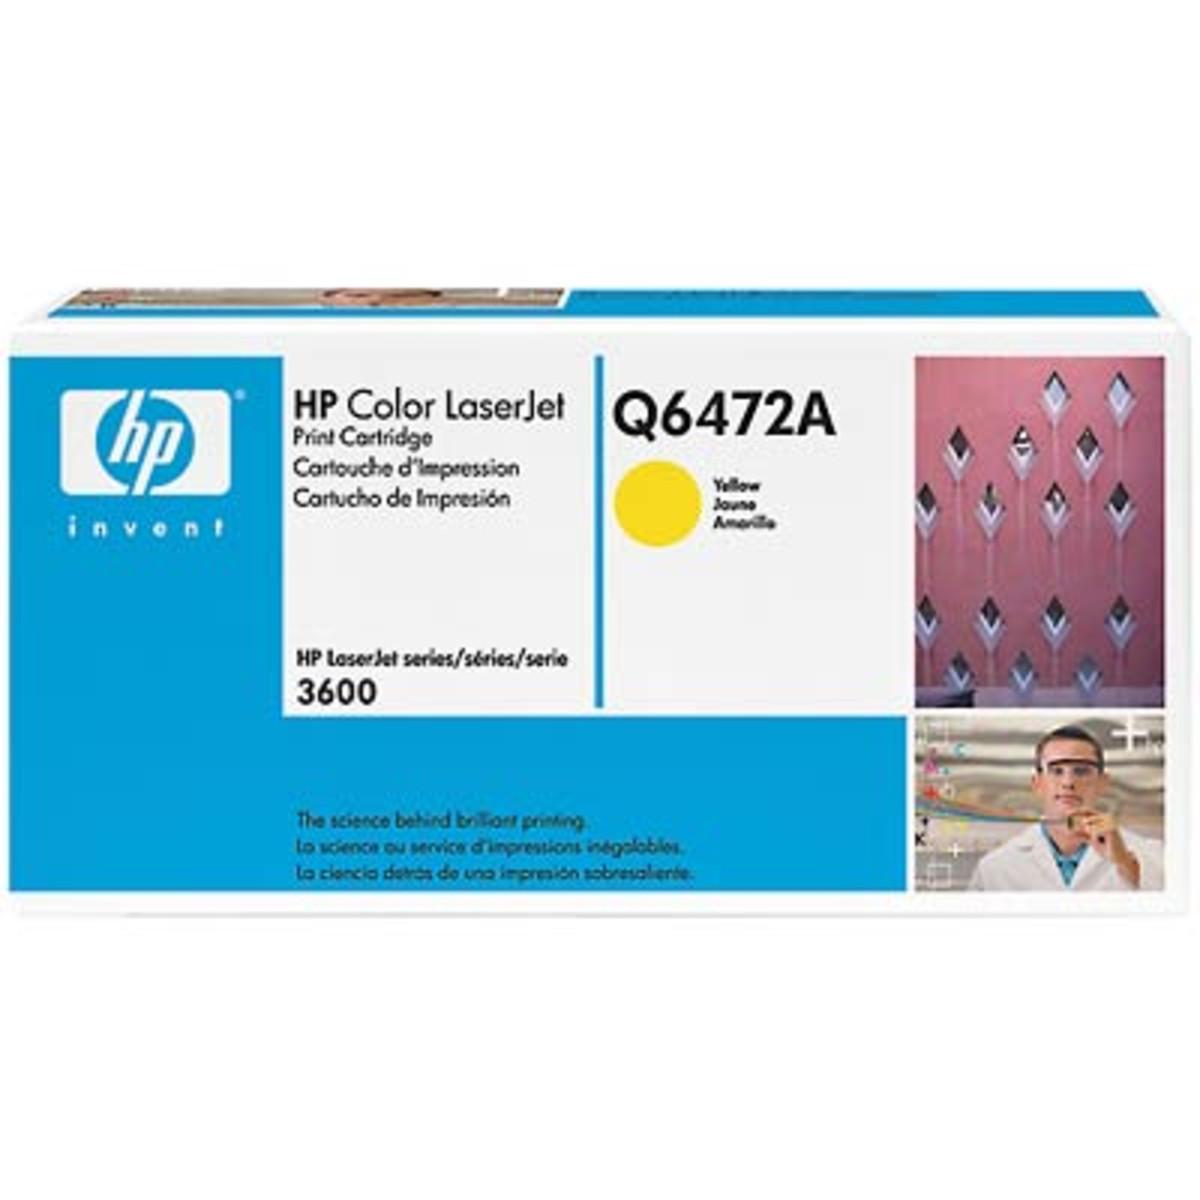 HP 502A (Q6472A) Yellow Toner Cartridge